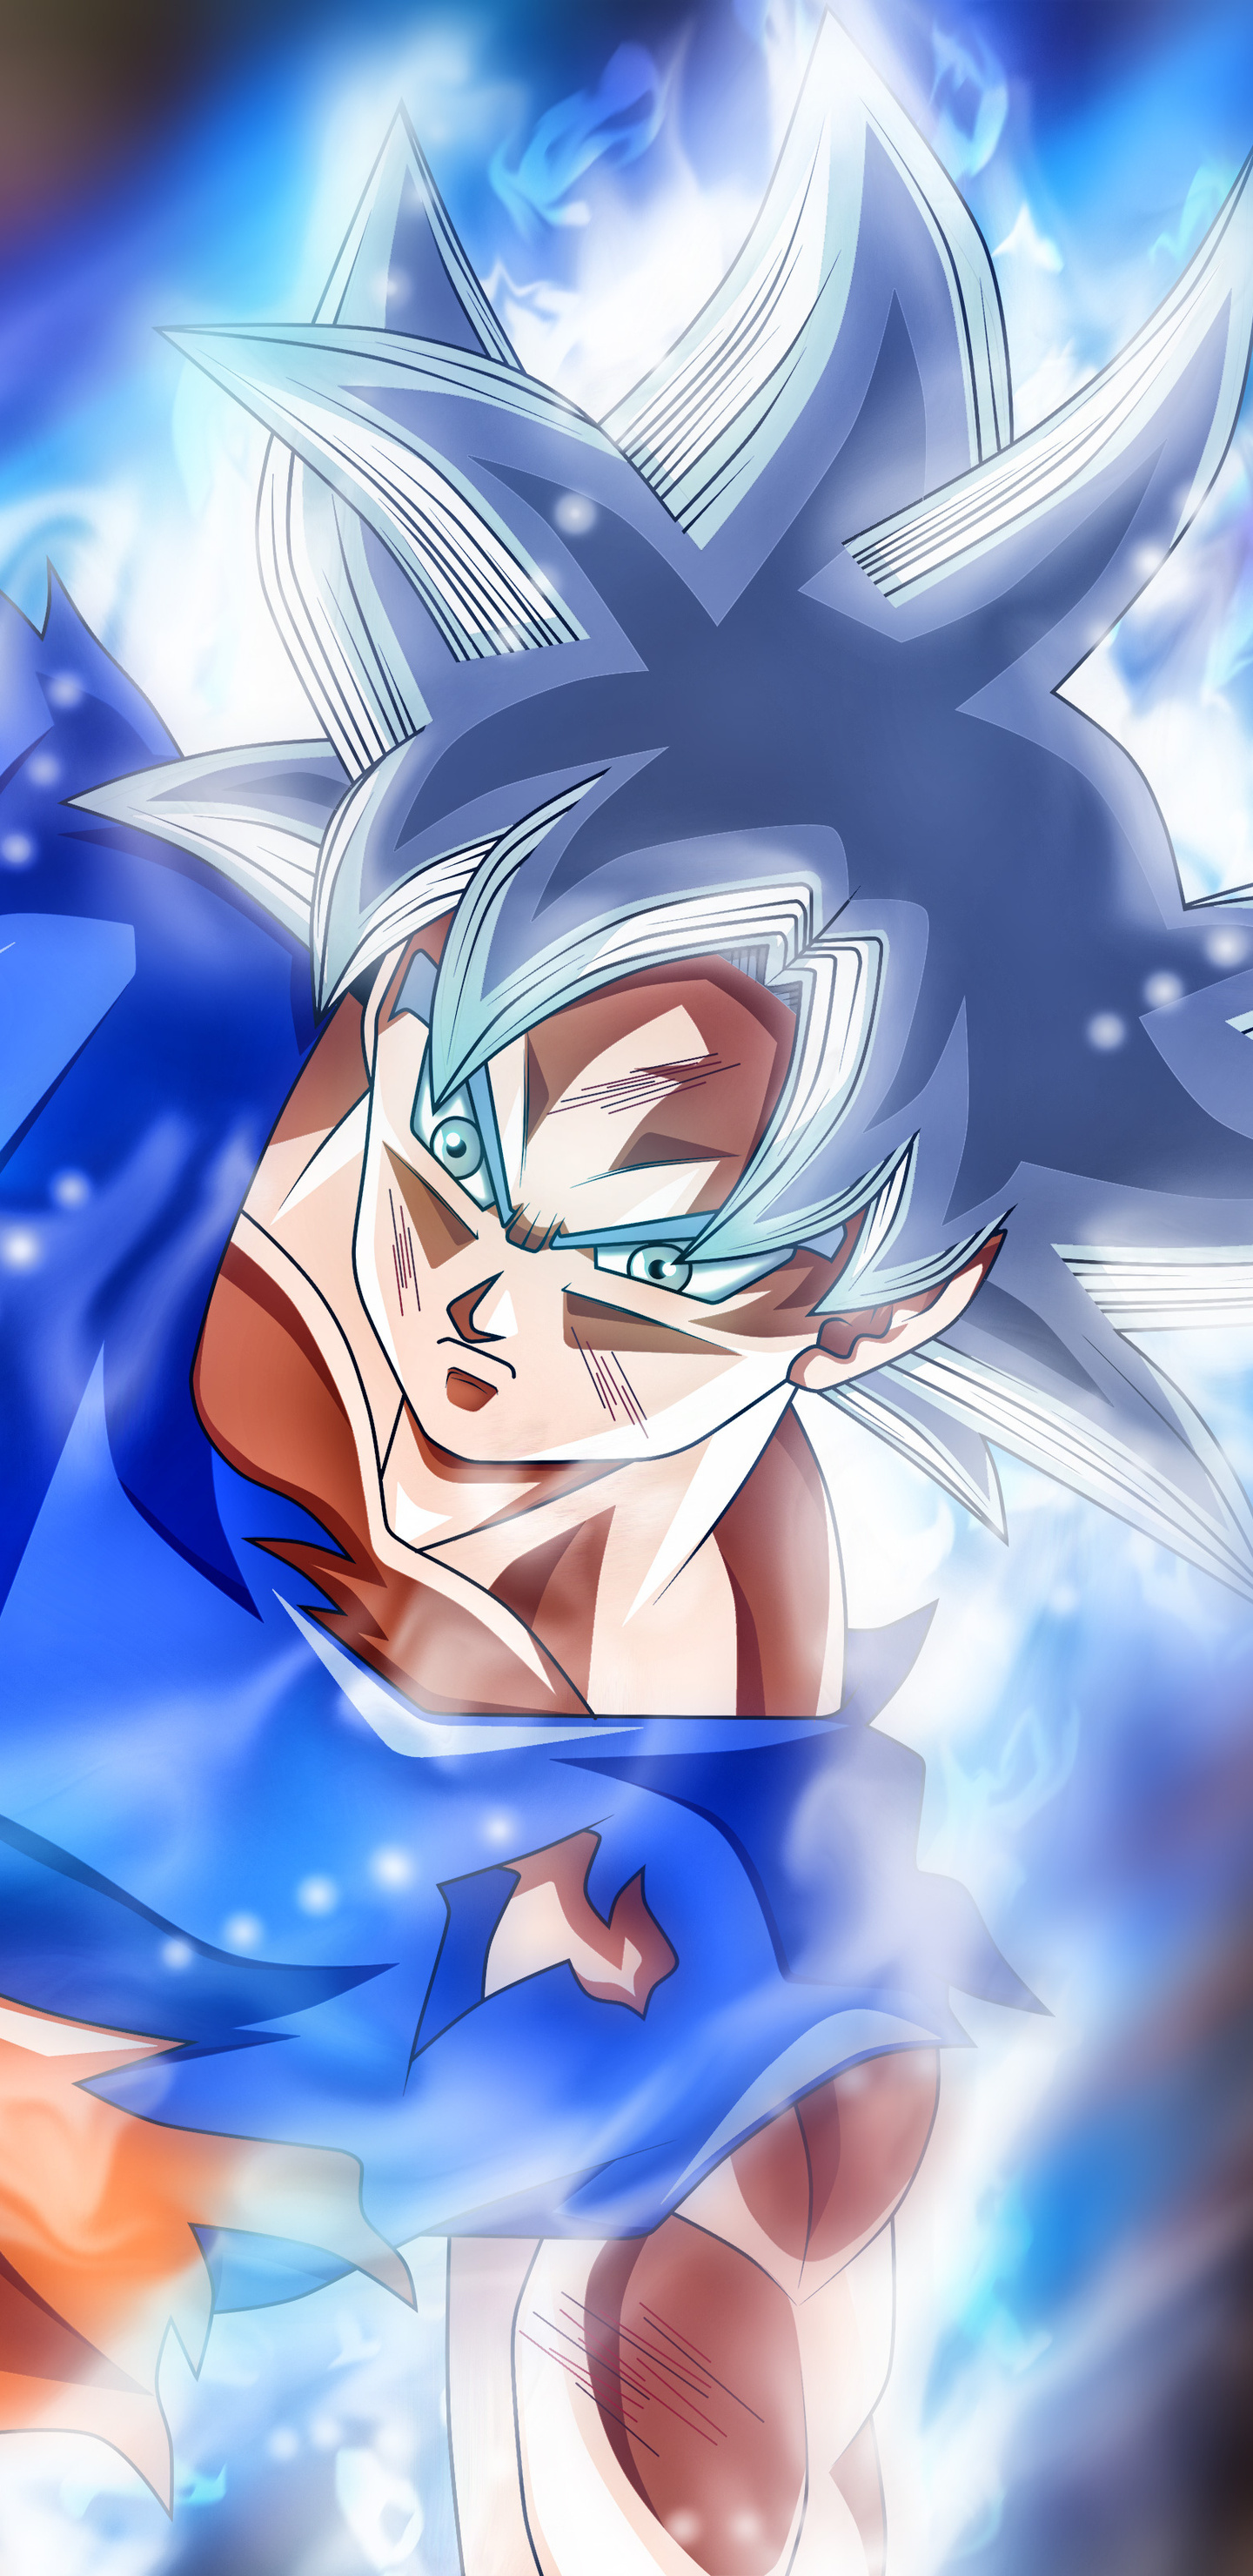 1440x2960 goku jiren masterd ultra instinct samsung galaxy - Goku ultra instinct mastered wallpaper ...